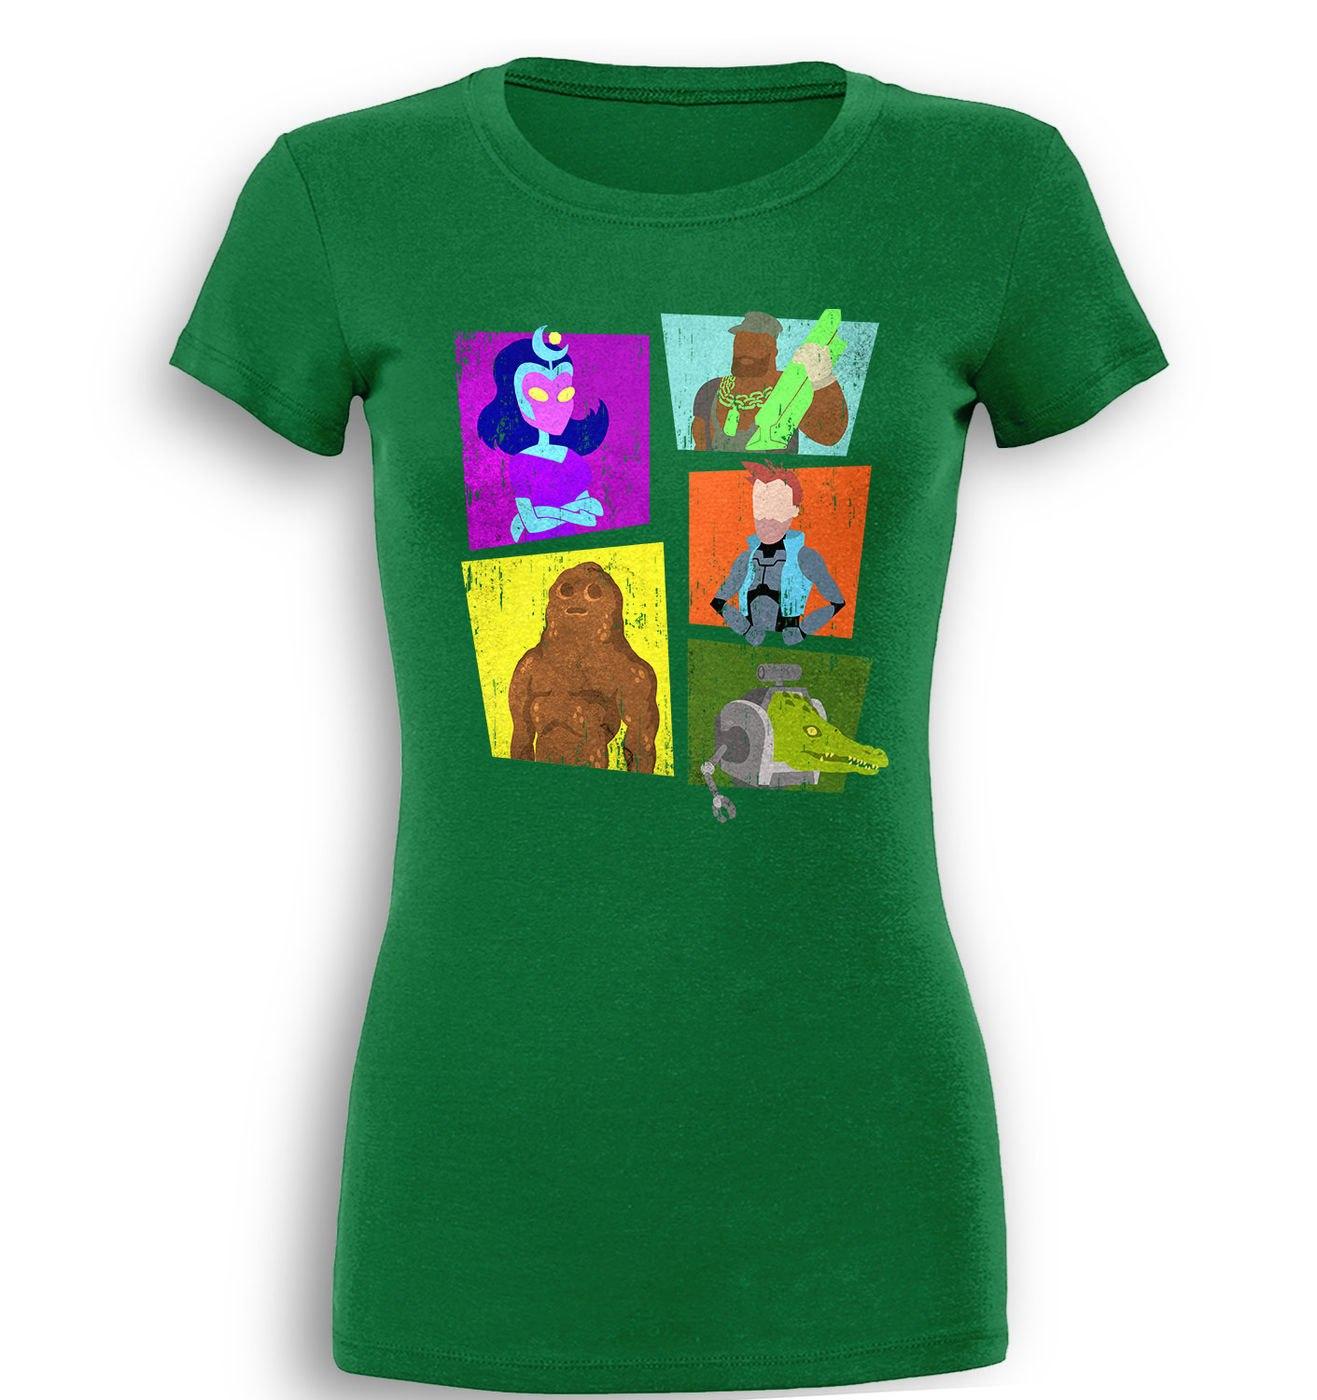 Vindicators 3 premium women's t-shirt by Something Geeky